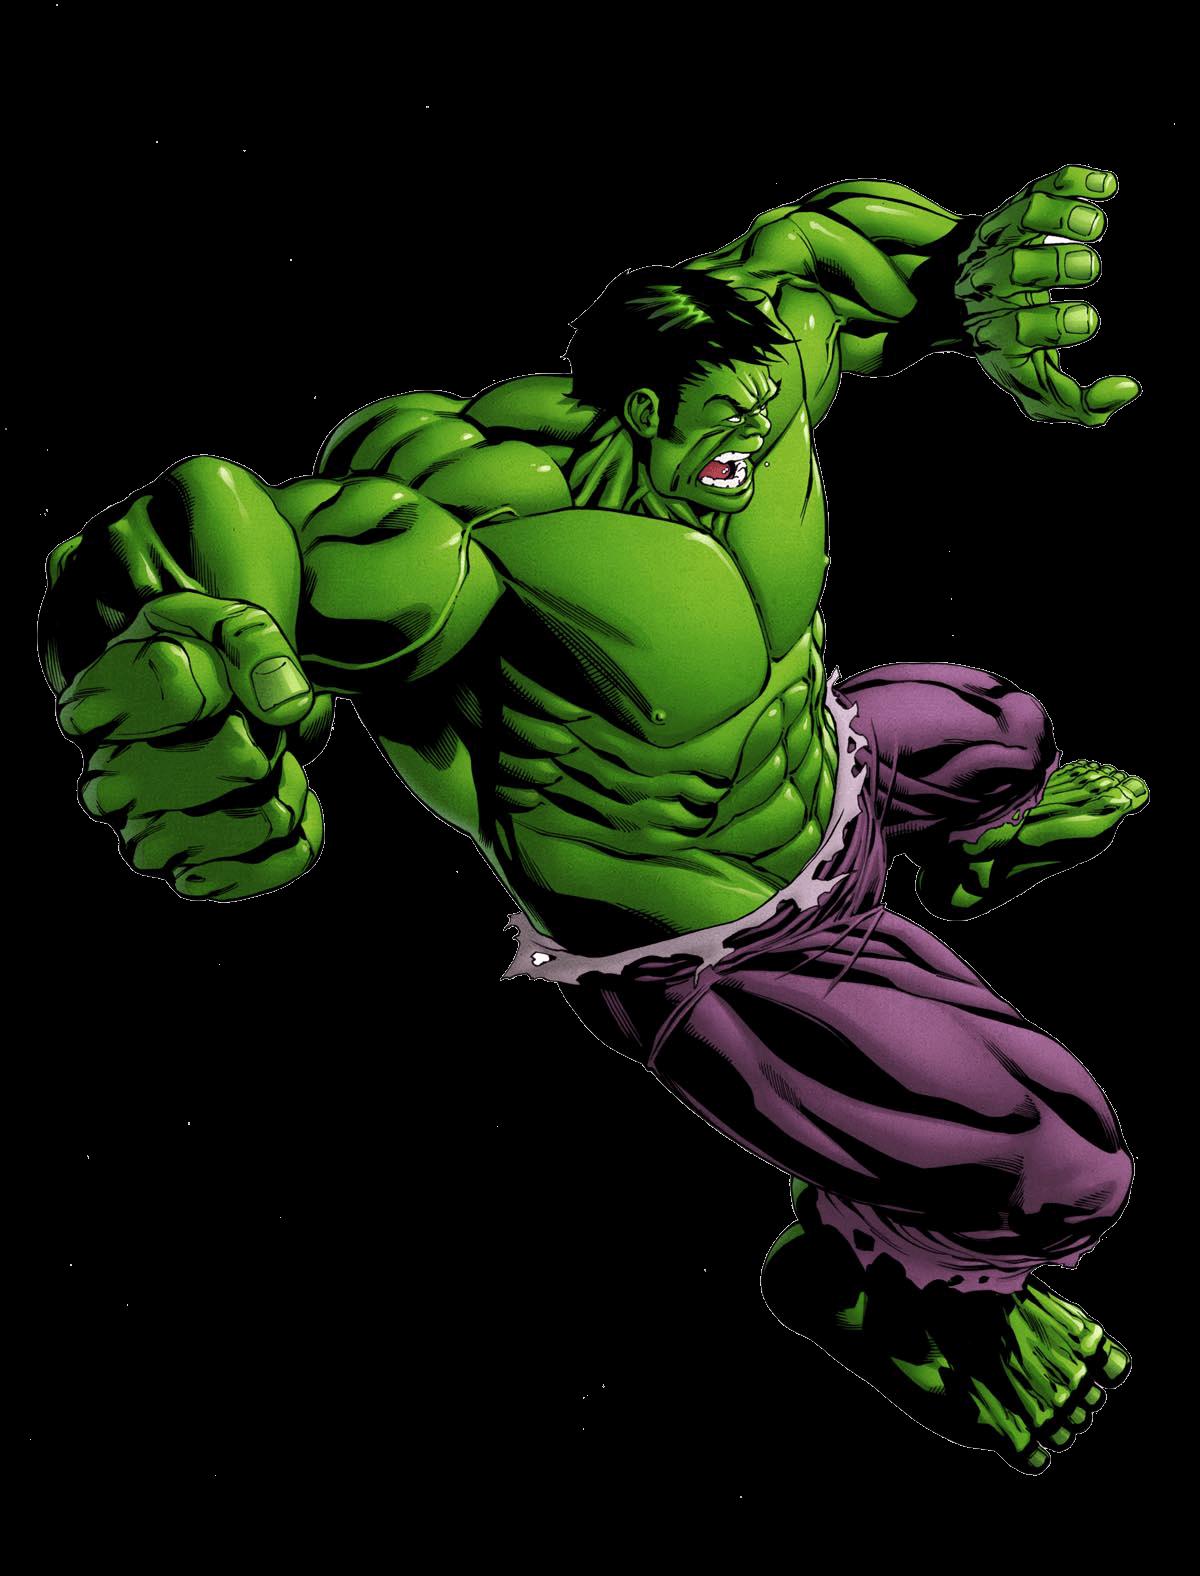 clip library library Hd cartoon . Hulk clipart.